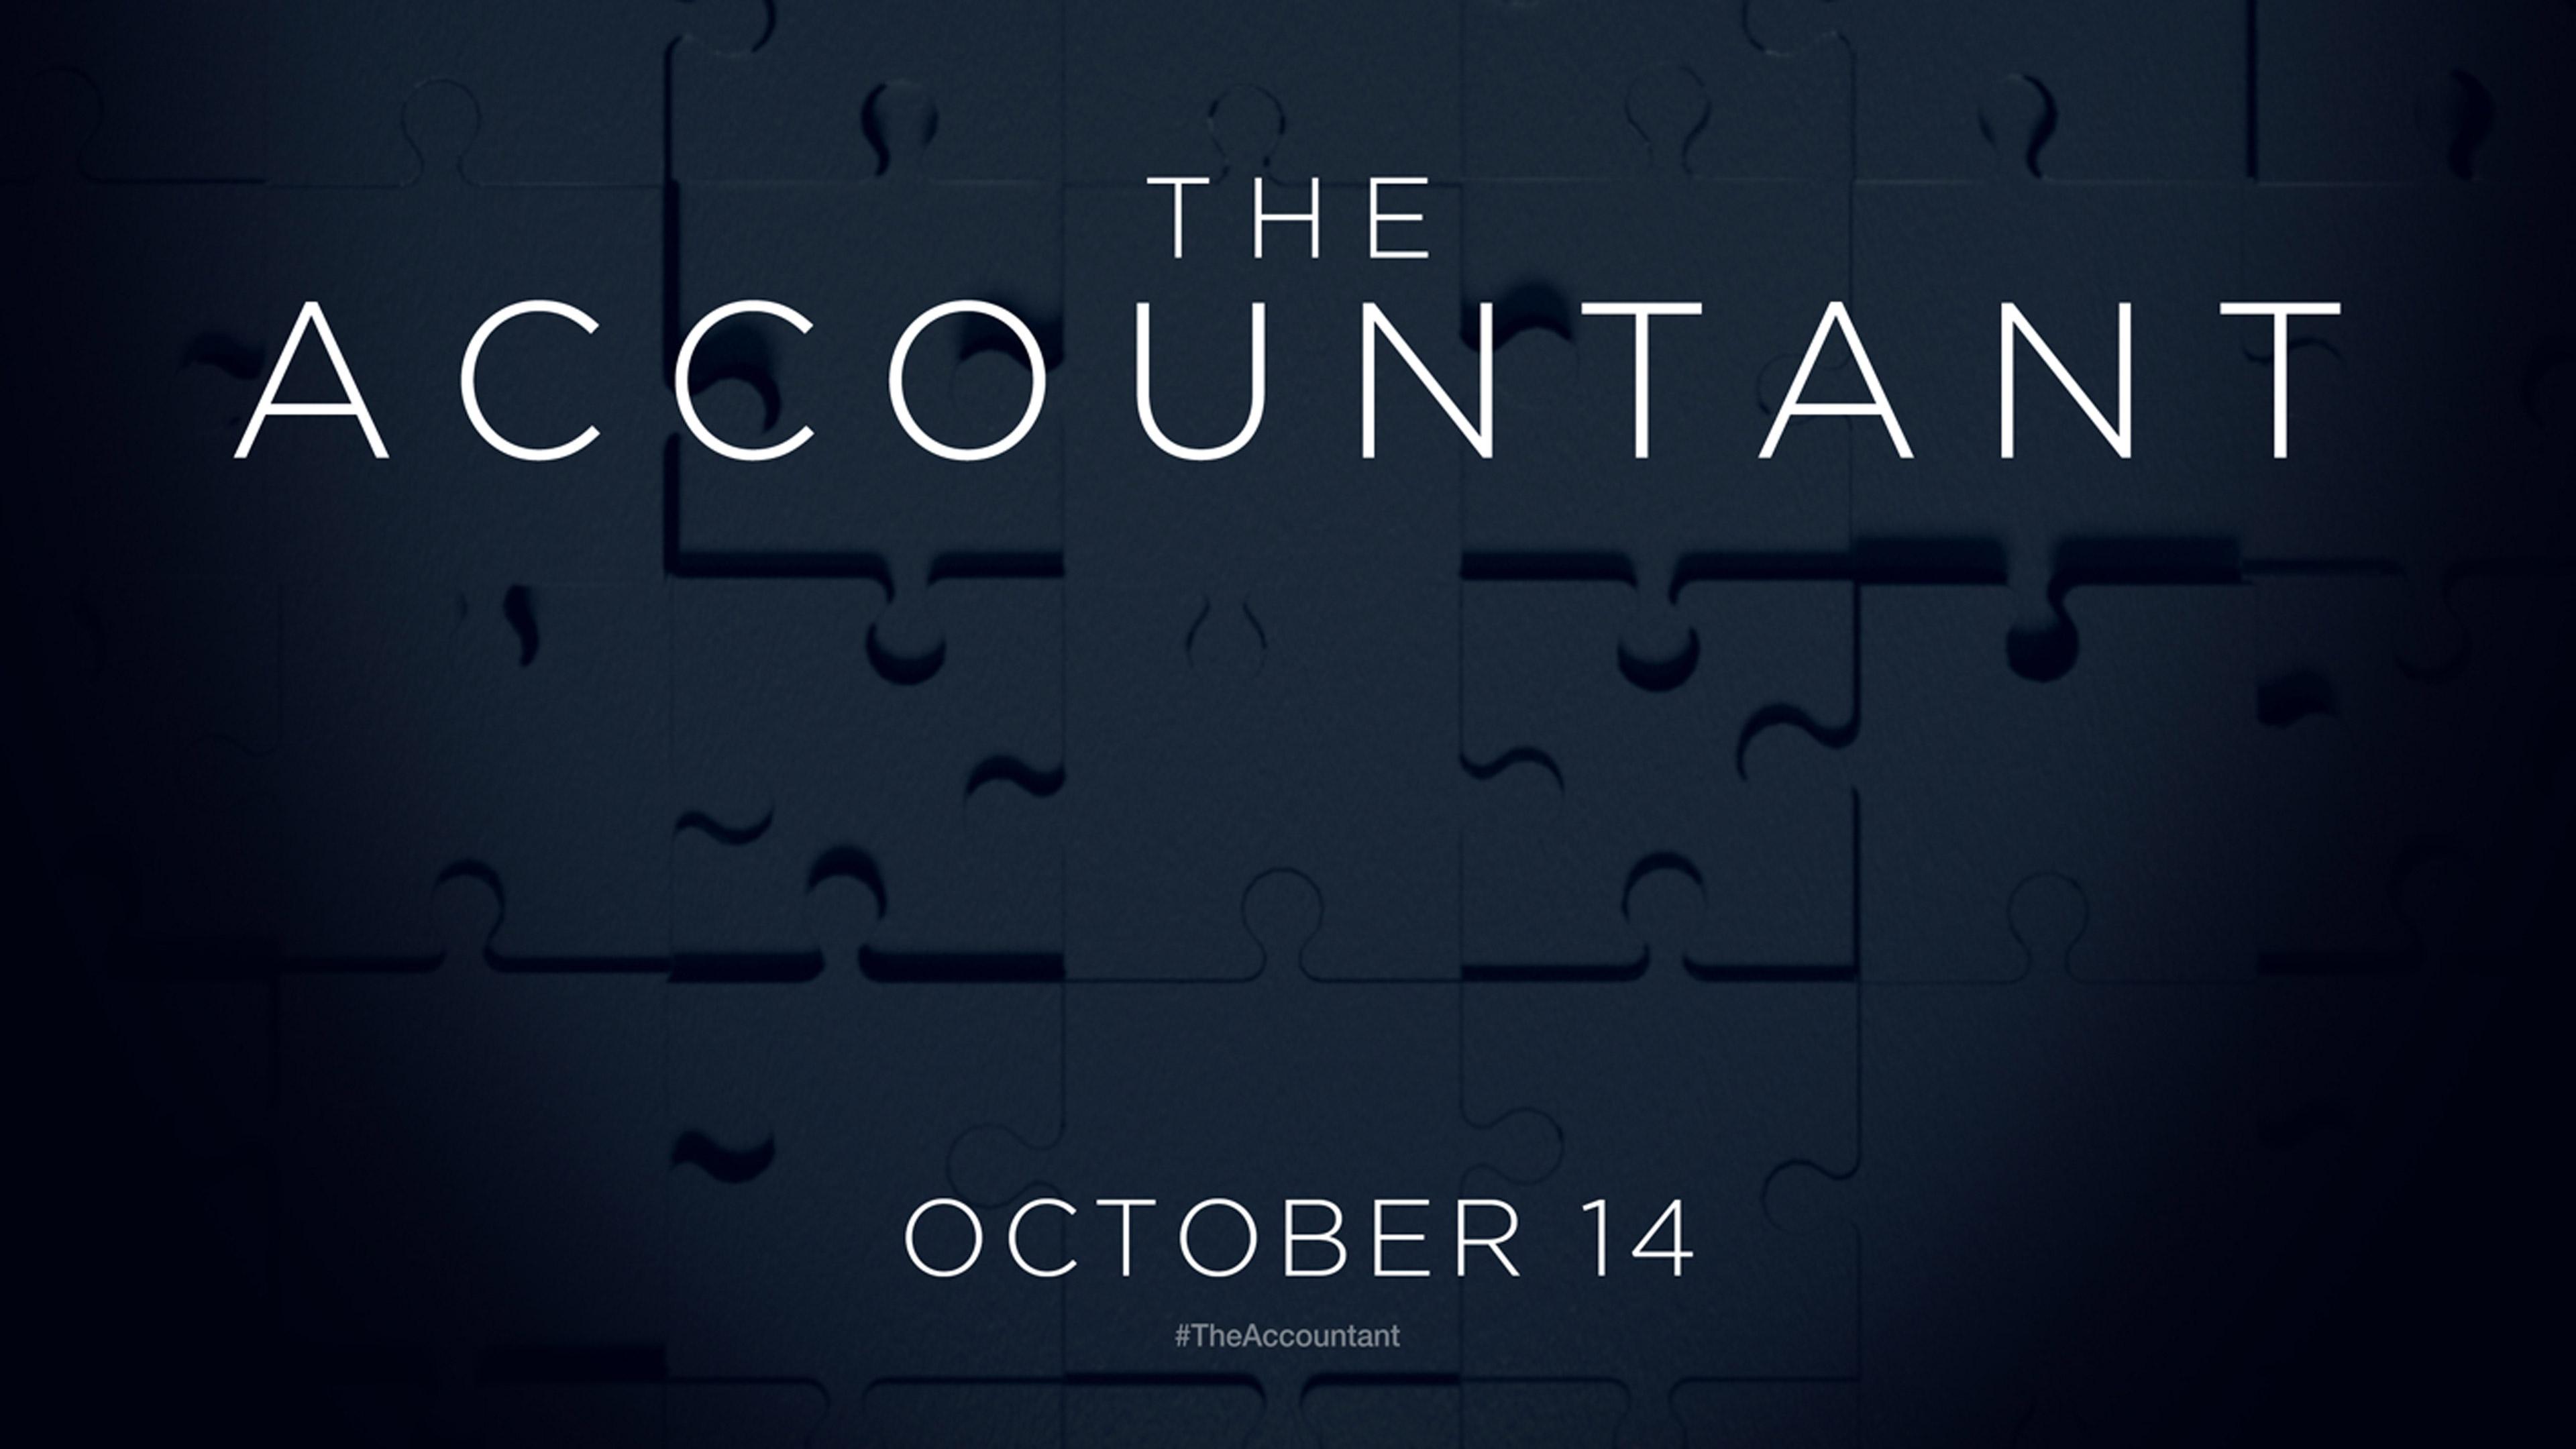 Download The Accountant Full Movie By Romeropb Memonic